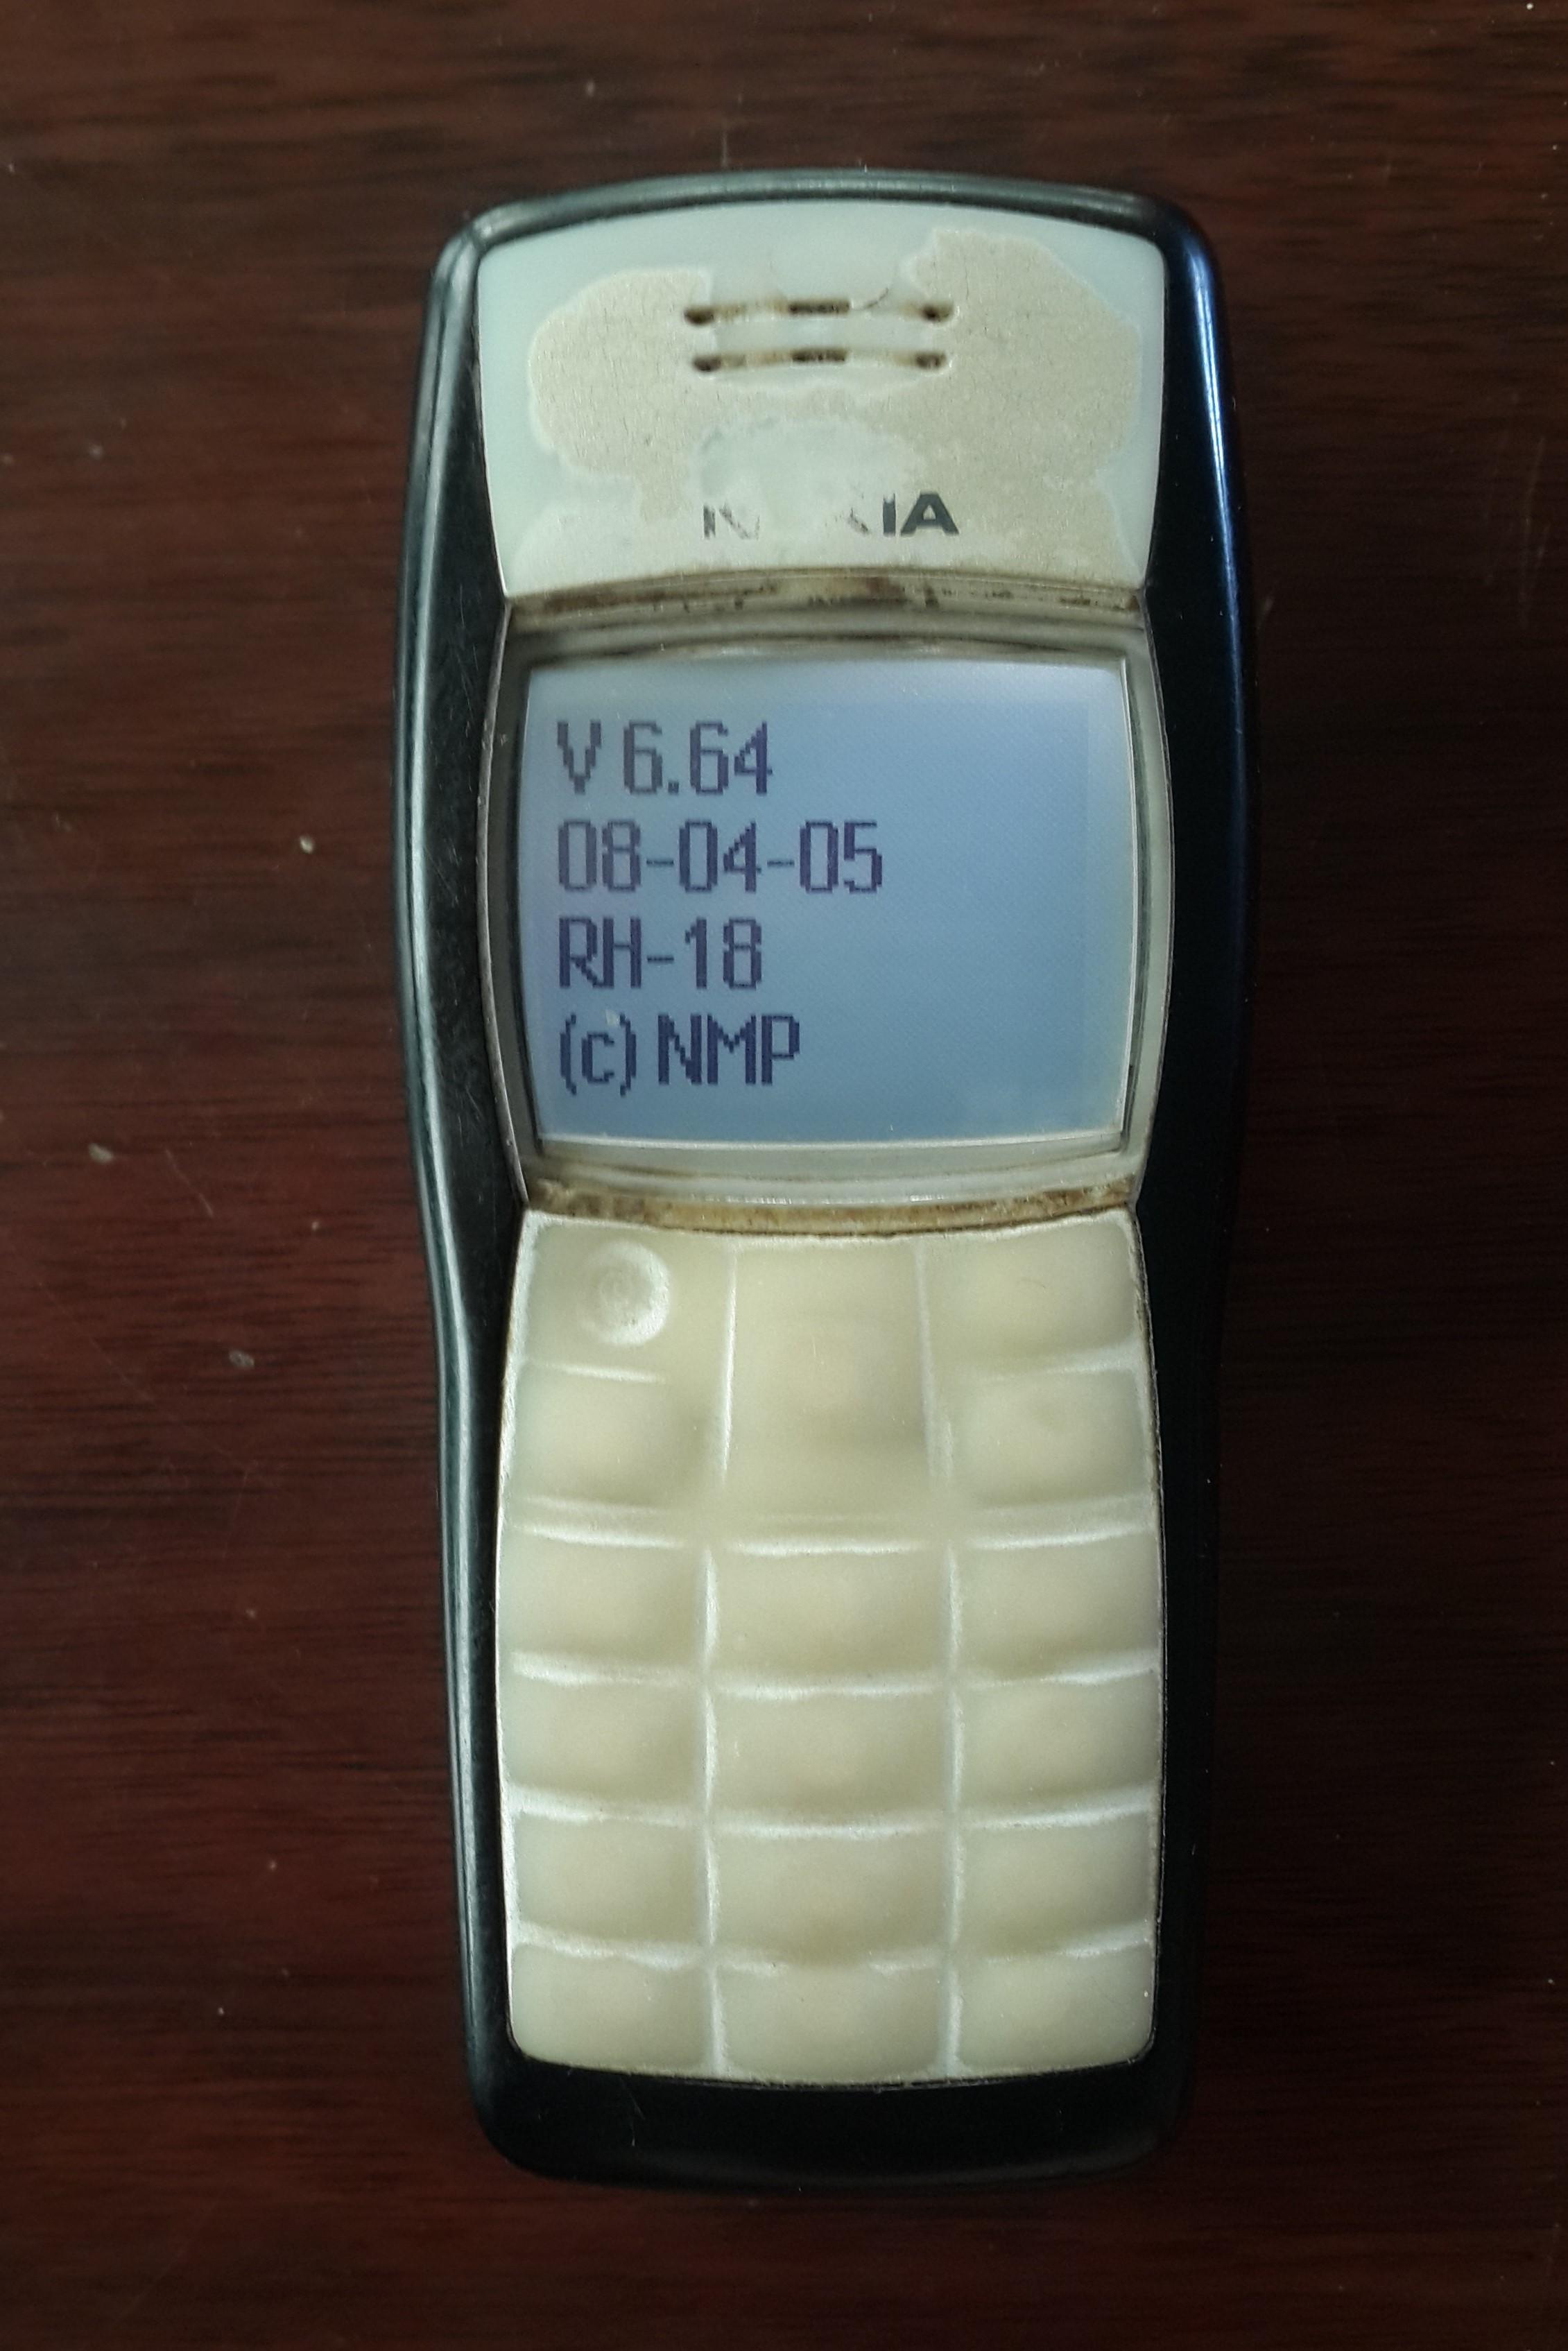 File:Nokia 1108-b.jpg